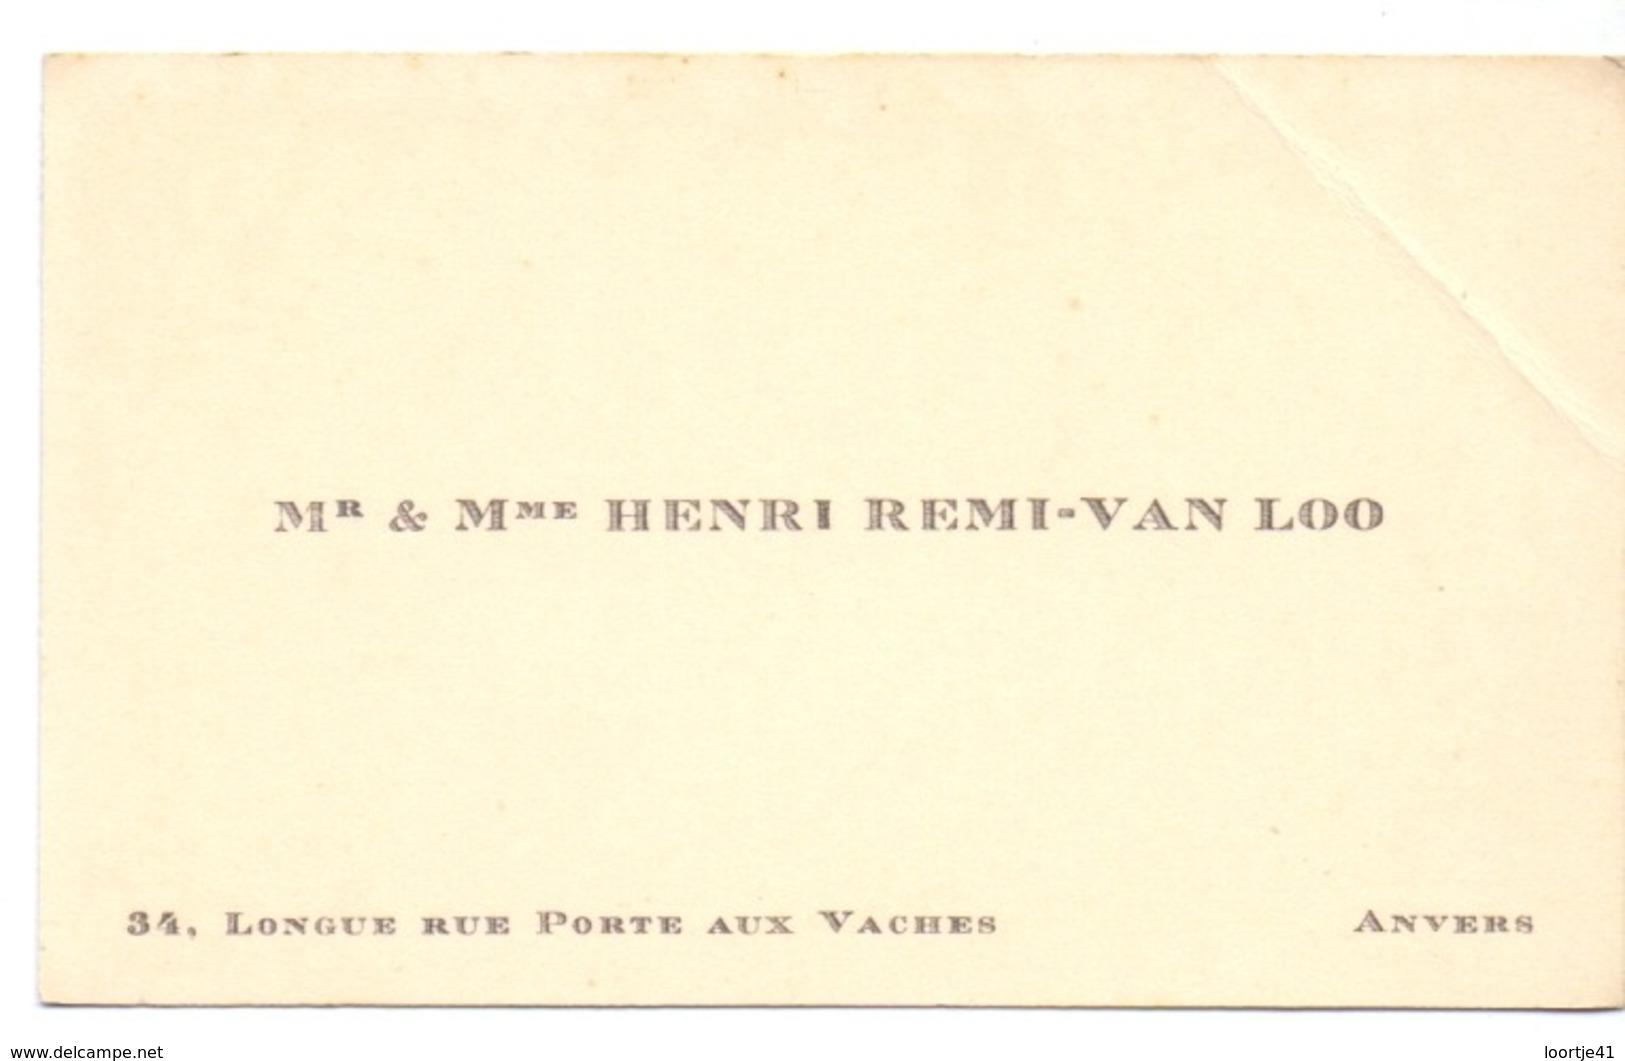 Visitekaartje - Carte Visite - Mr & Mme Henri Remi - Van Loo - Anvers Antwerpen - Cartoncini Da Visita